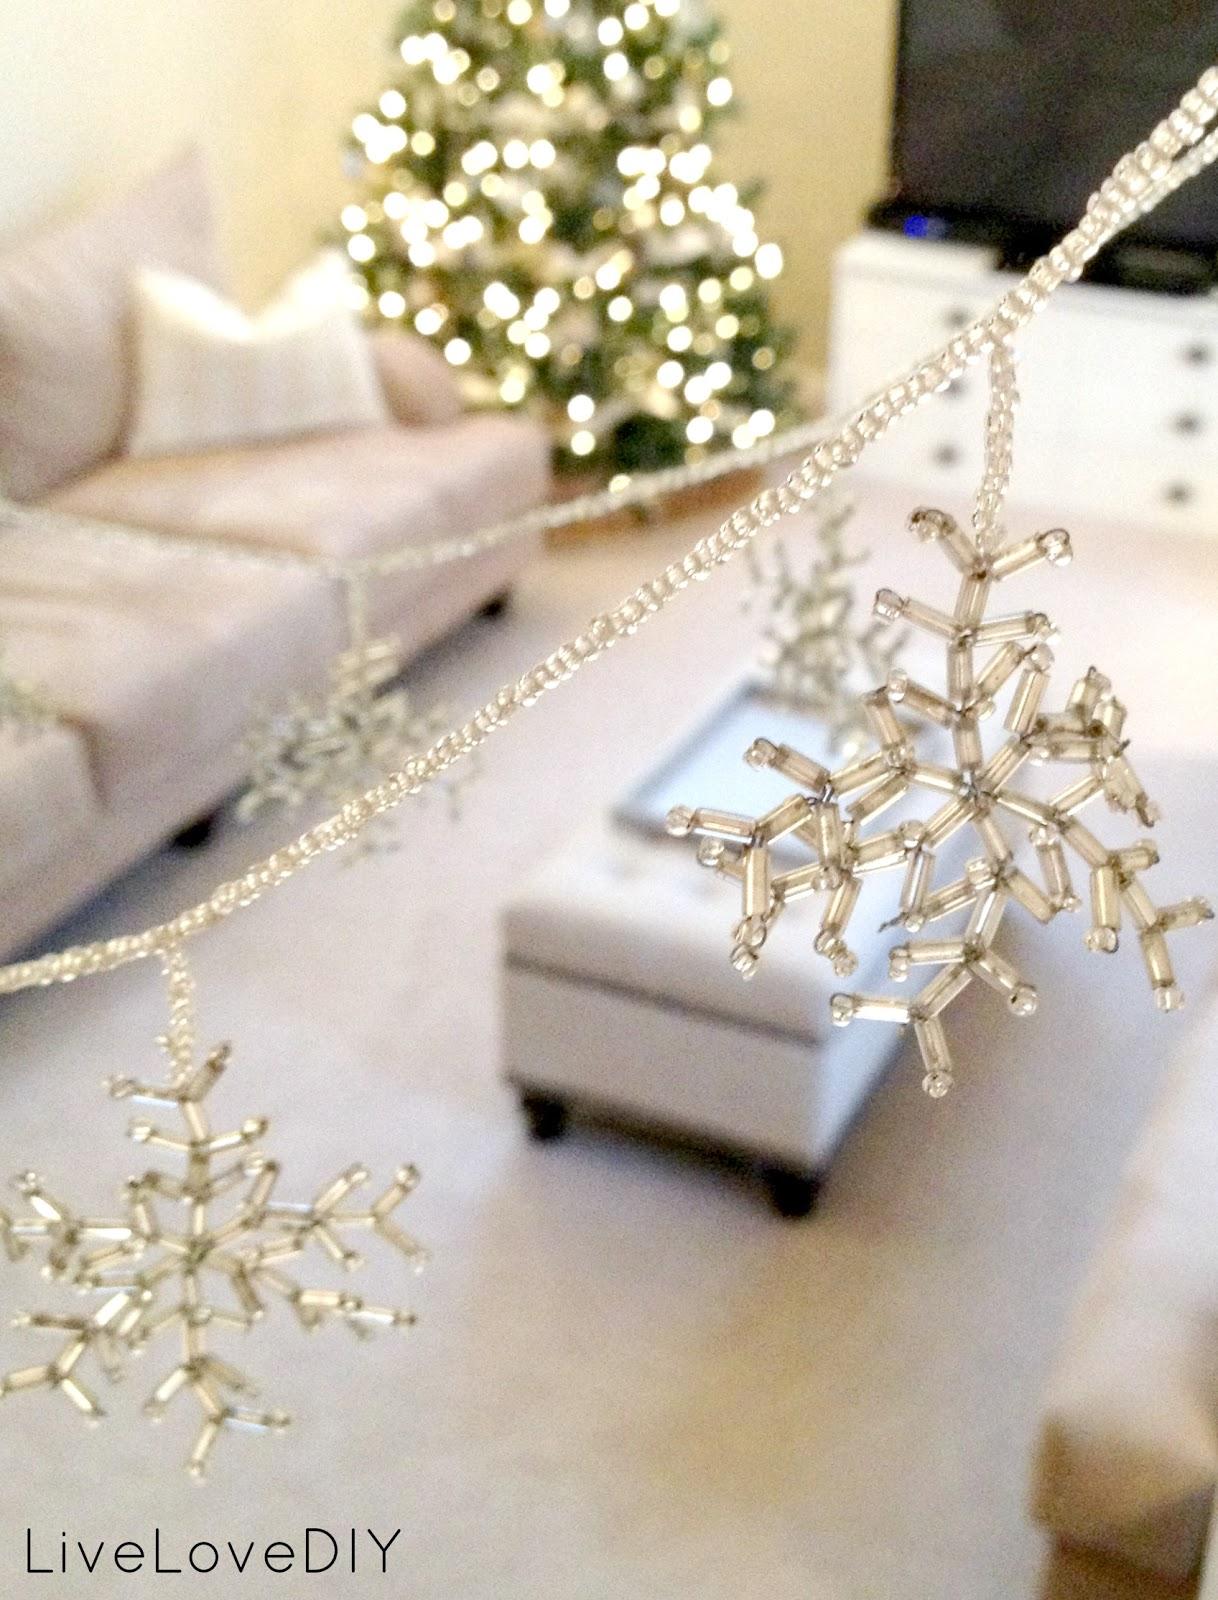 Livelovediy diy beaded snowflake garland